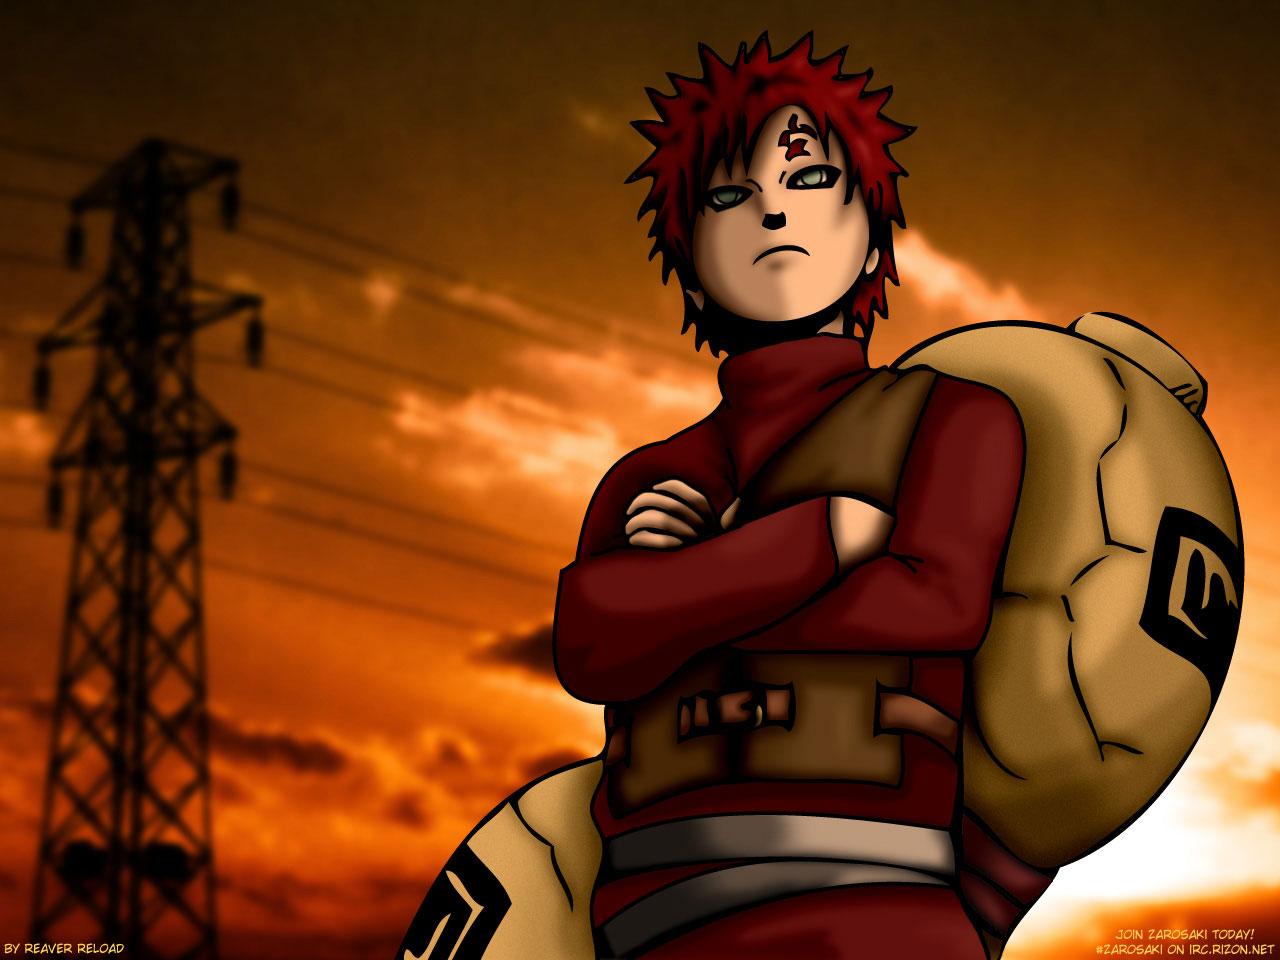 Anime Wallpaper Gaara HD Naruto Movie Anime Wallpapers 1280x960